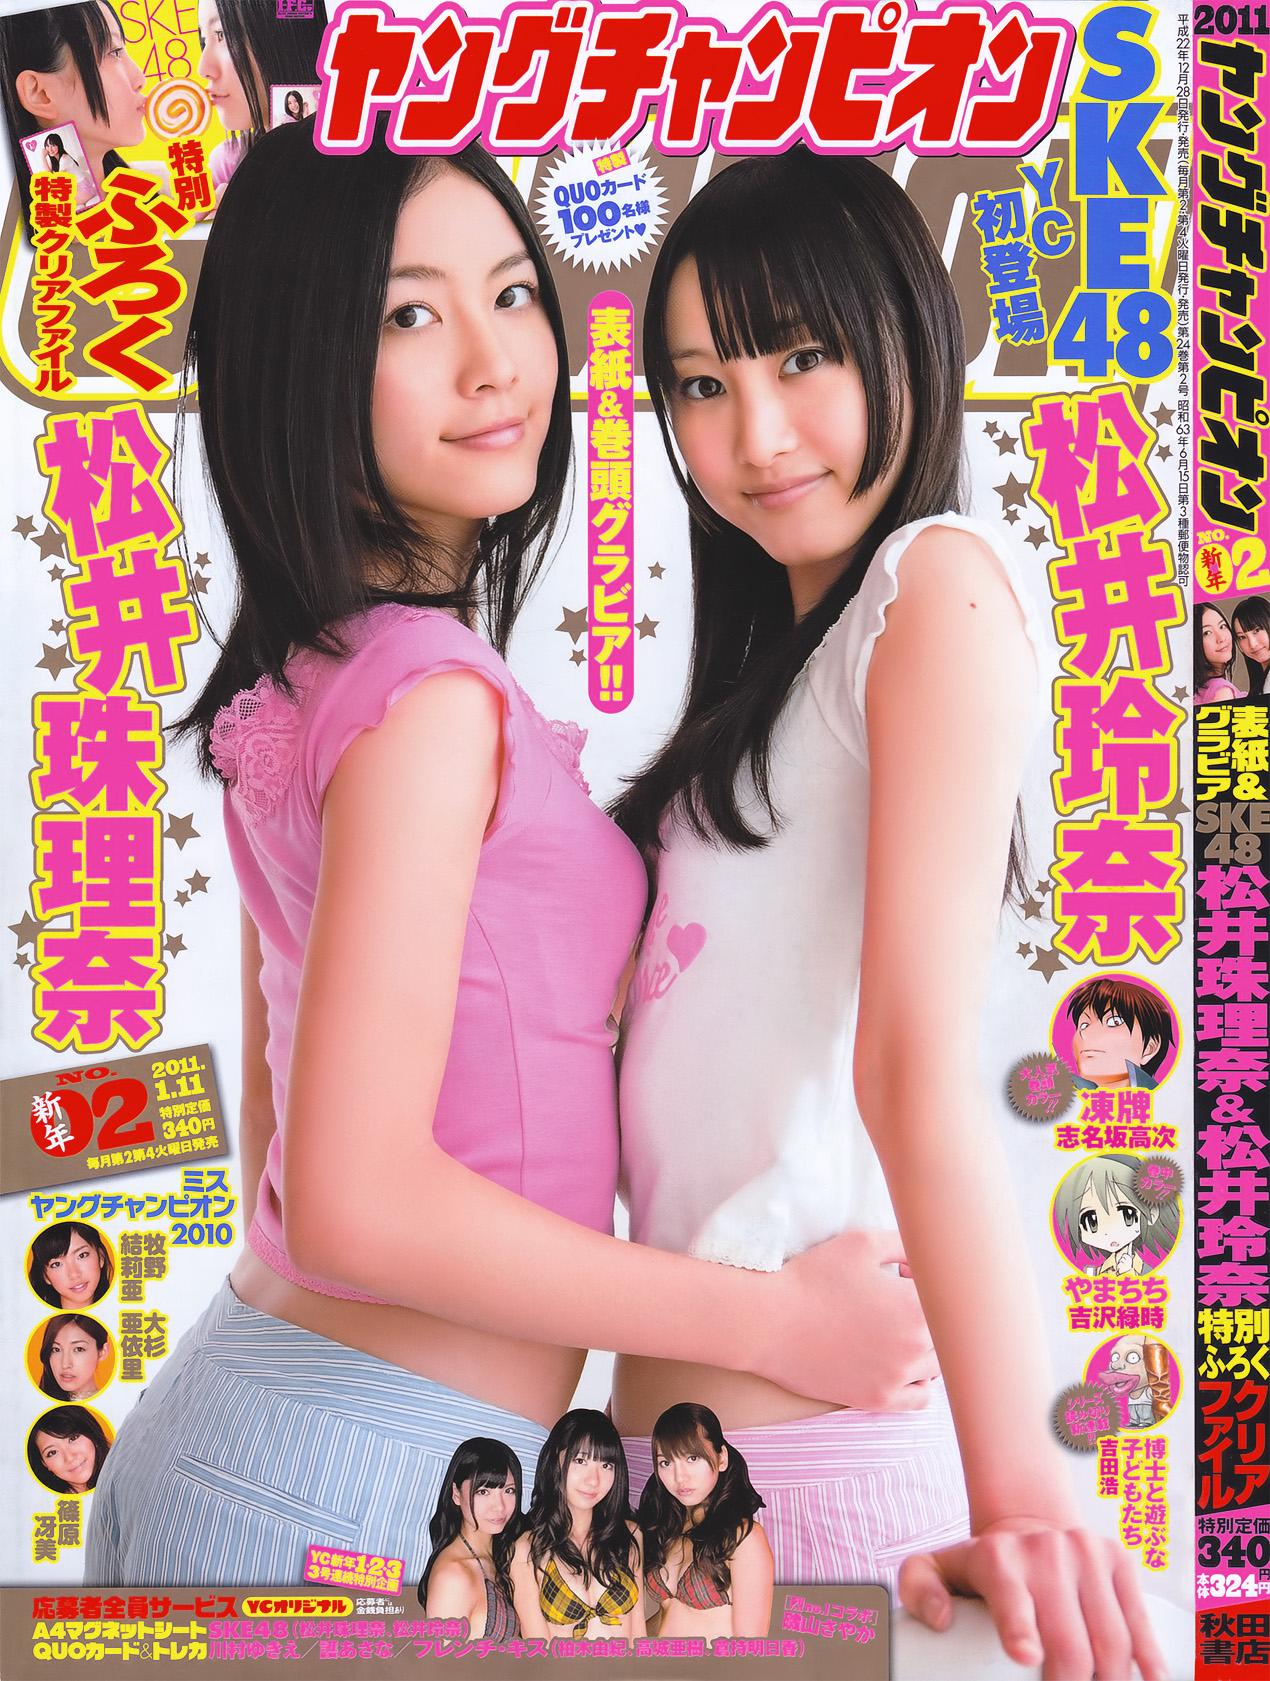 yc-2011-no-02-01-jpg [Young Champion] 2011 No.02 Rena Matsui 松井玲奈 & Jurina Matsui 松井珠理奈 [14P10MB] young 08030